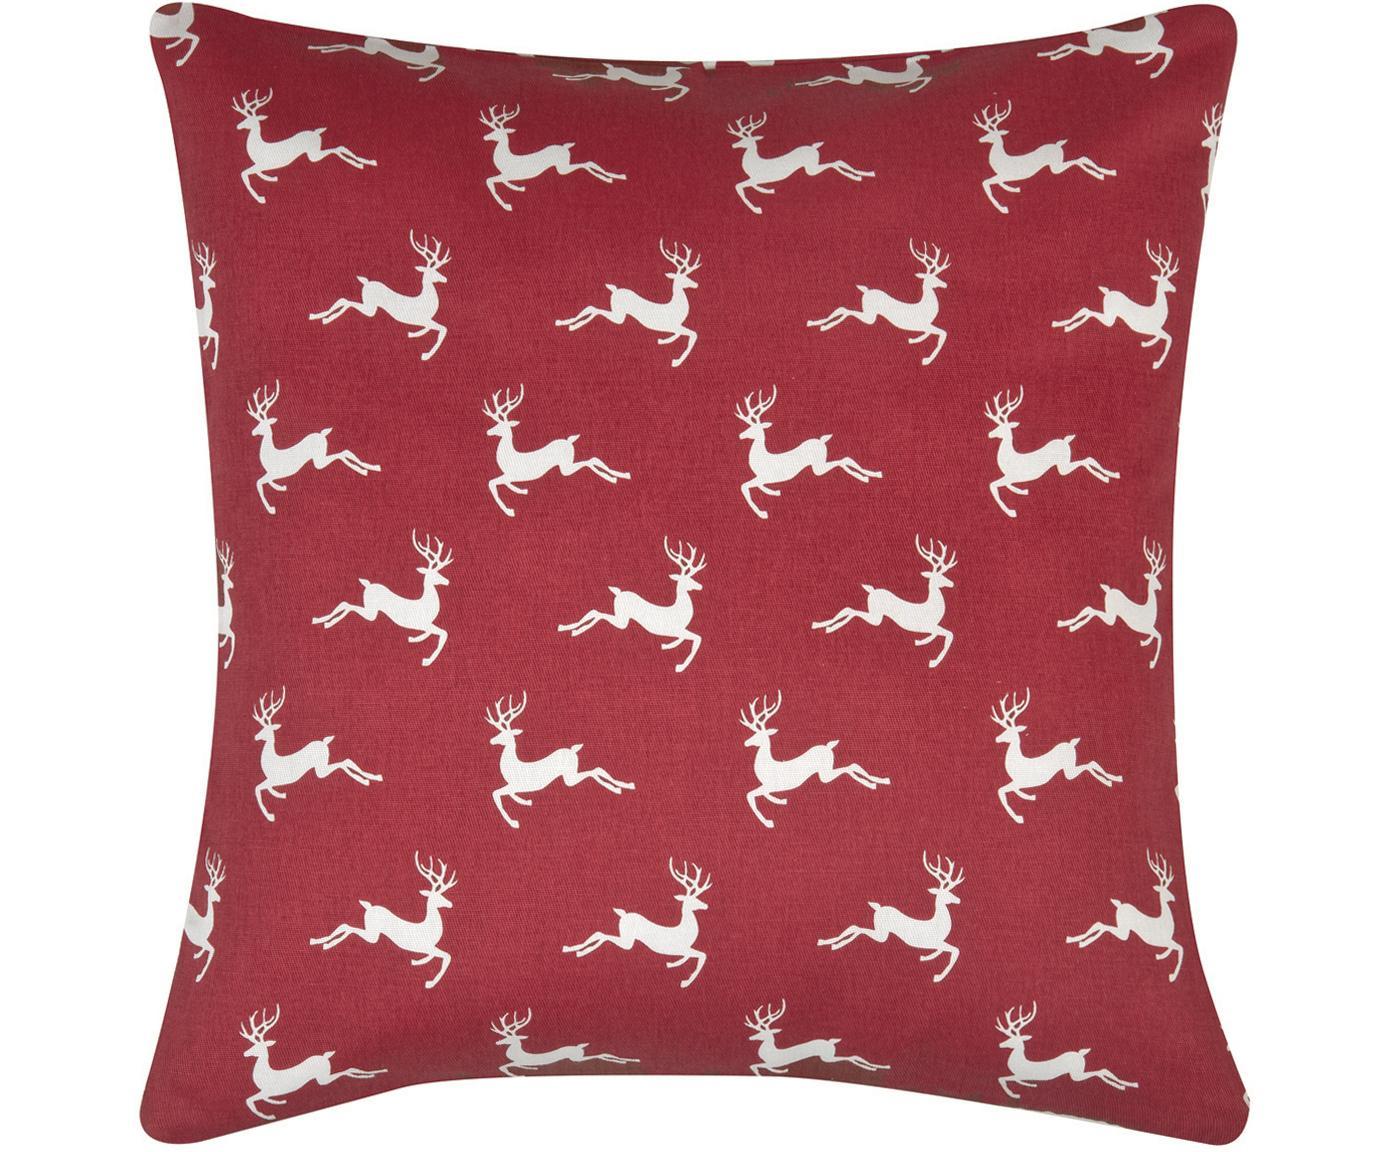 Federa natalizia con cervi Deers, 100% cotone, tessuto panama, Rosso scuro, ecru, Larg. 40 x Lung. 40 cm